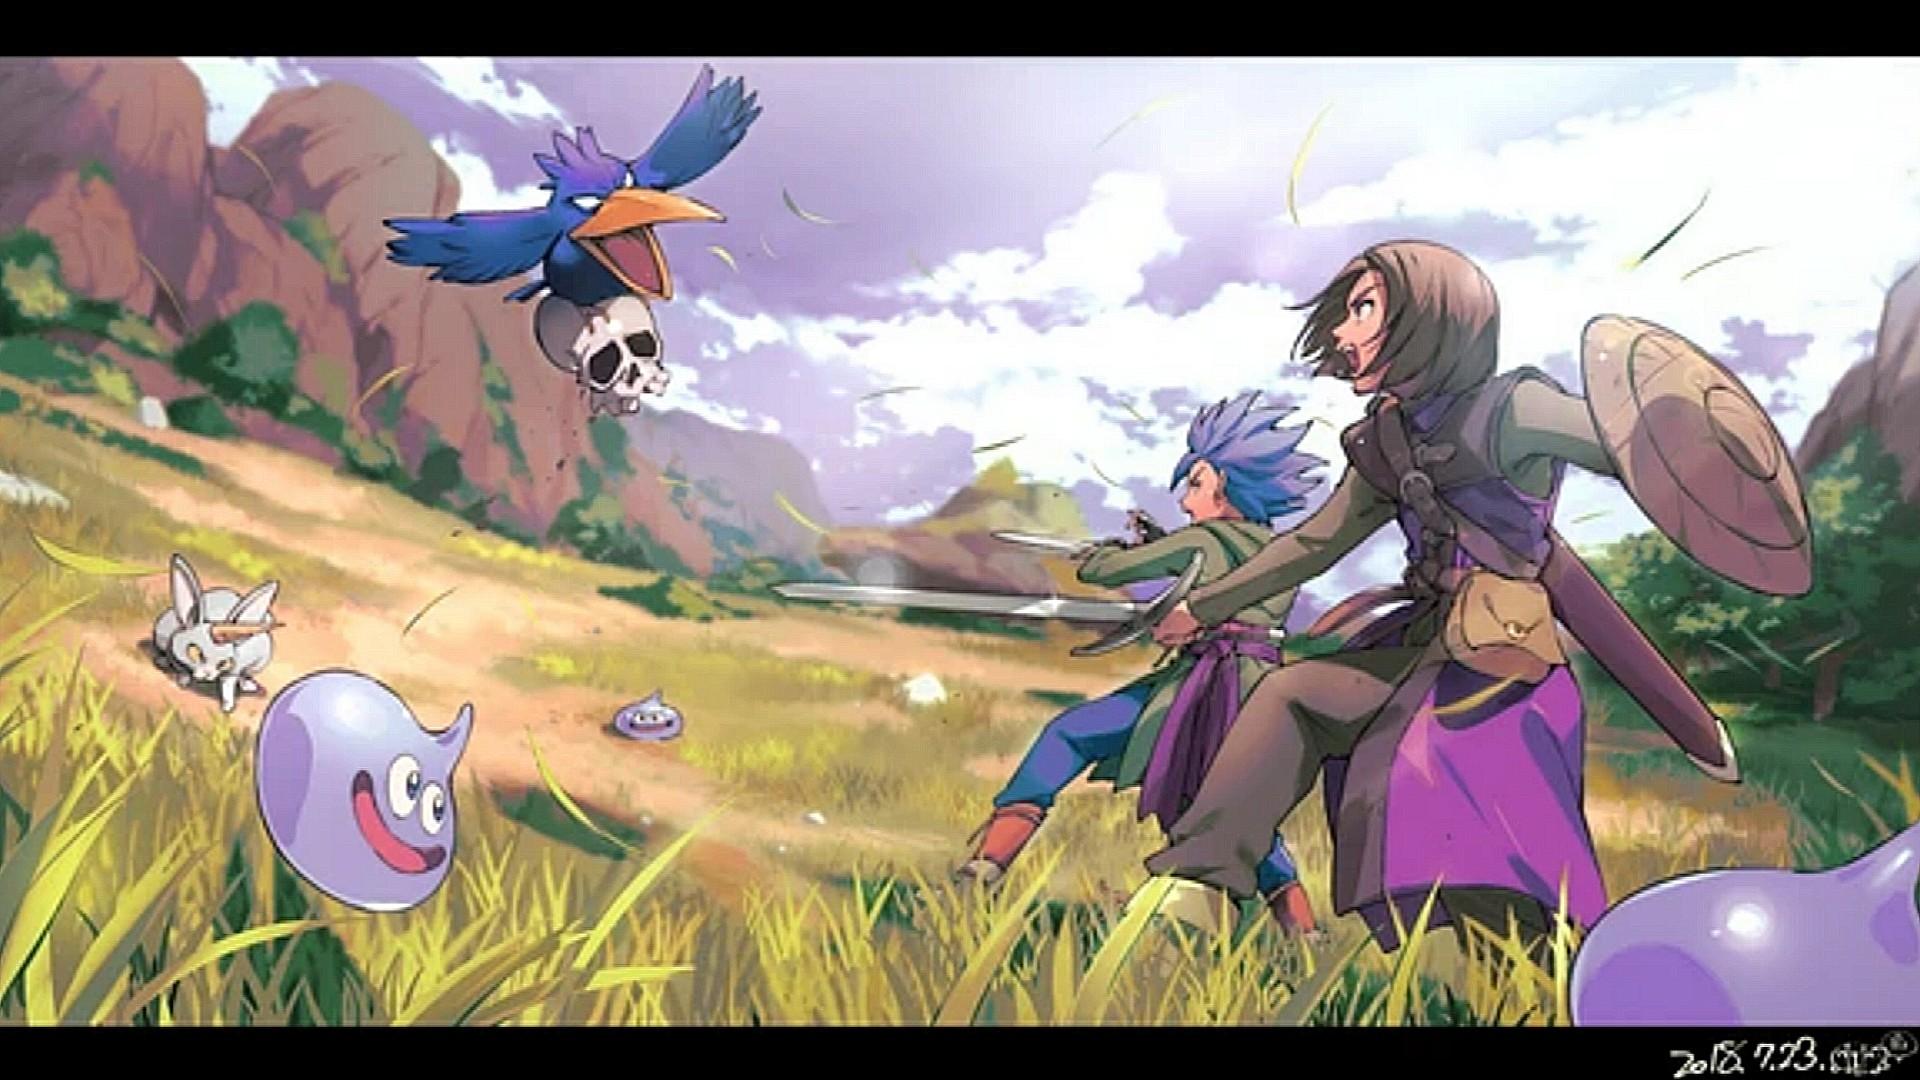 Dragon Quest Xi Wallpaper 2397758 Zerochan Anime Image Board